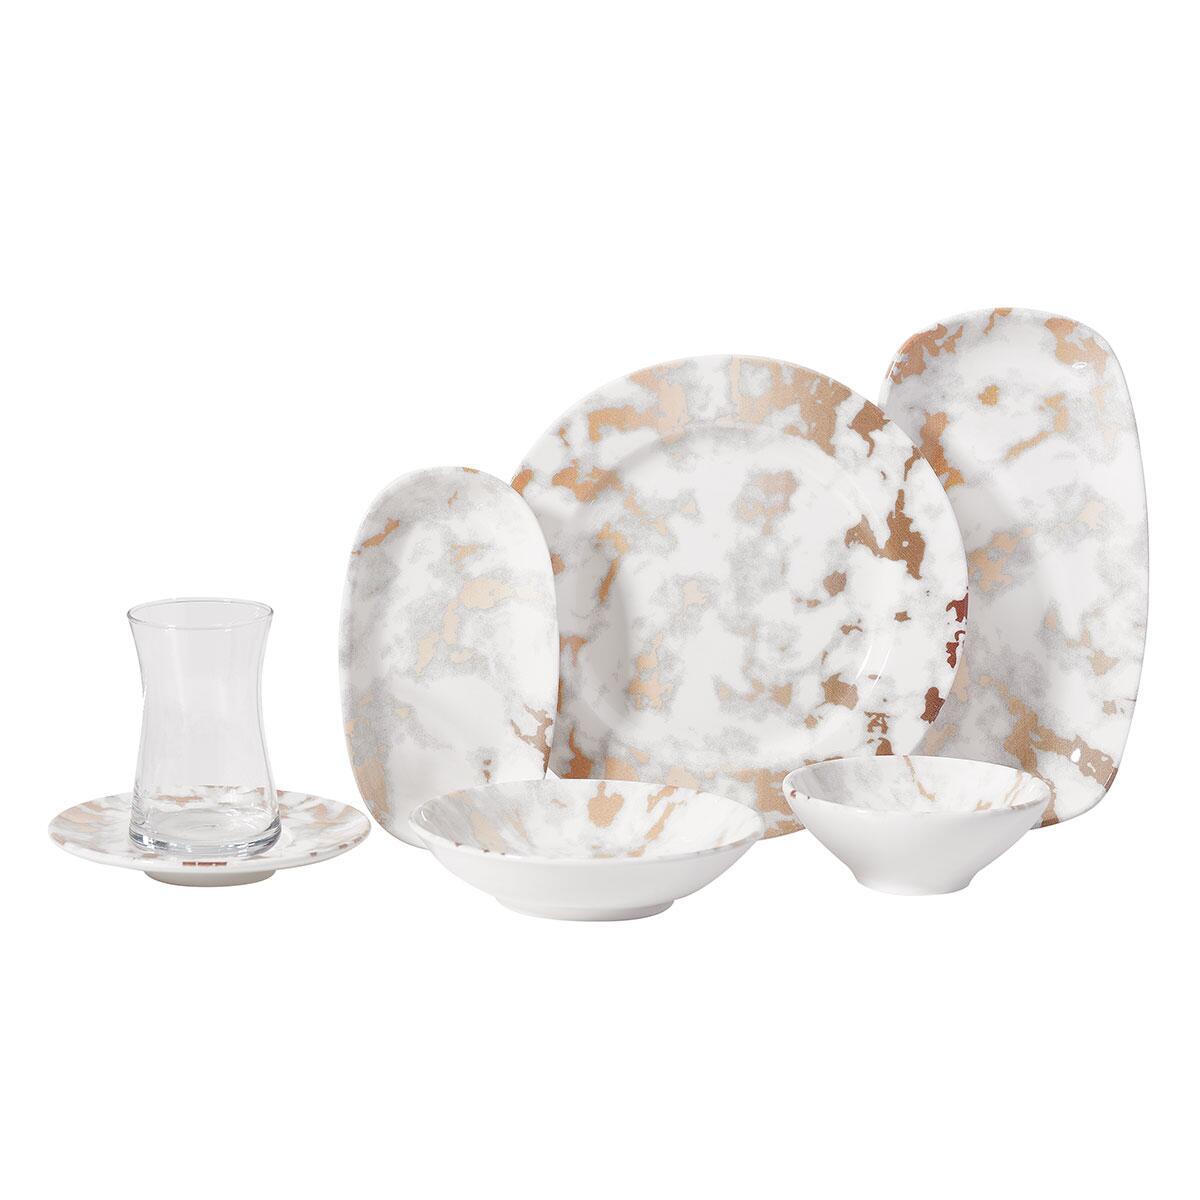 Korkmaz - Korkmaz Doğa Collection 26 Parça Kahvaltı Takımı